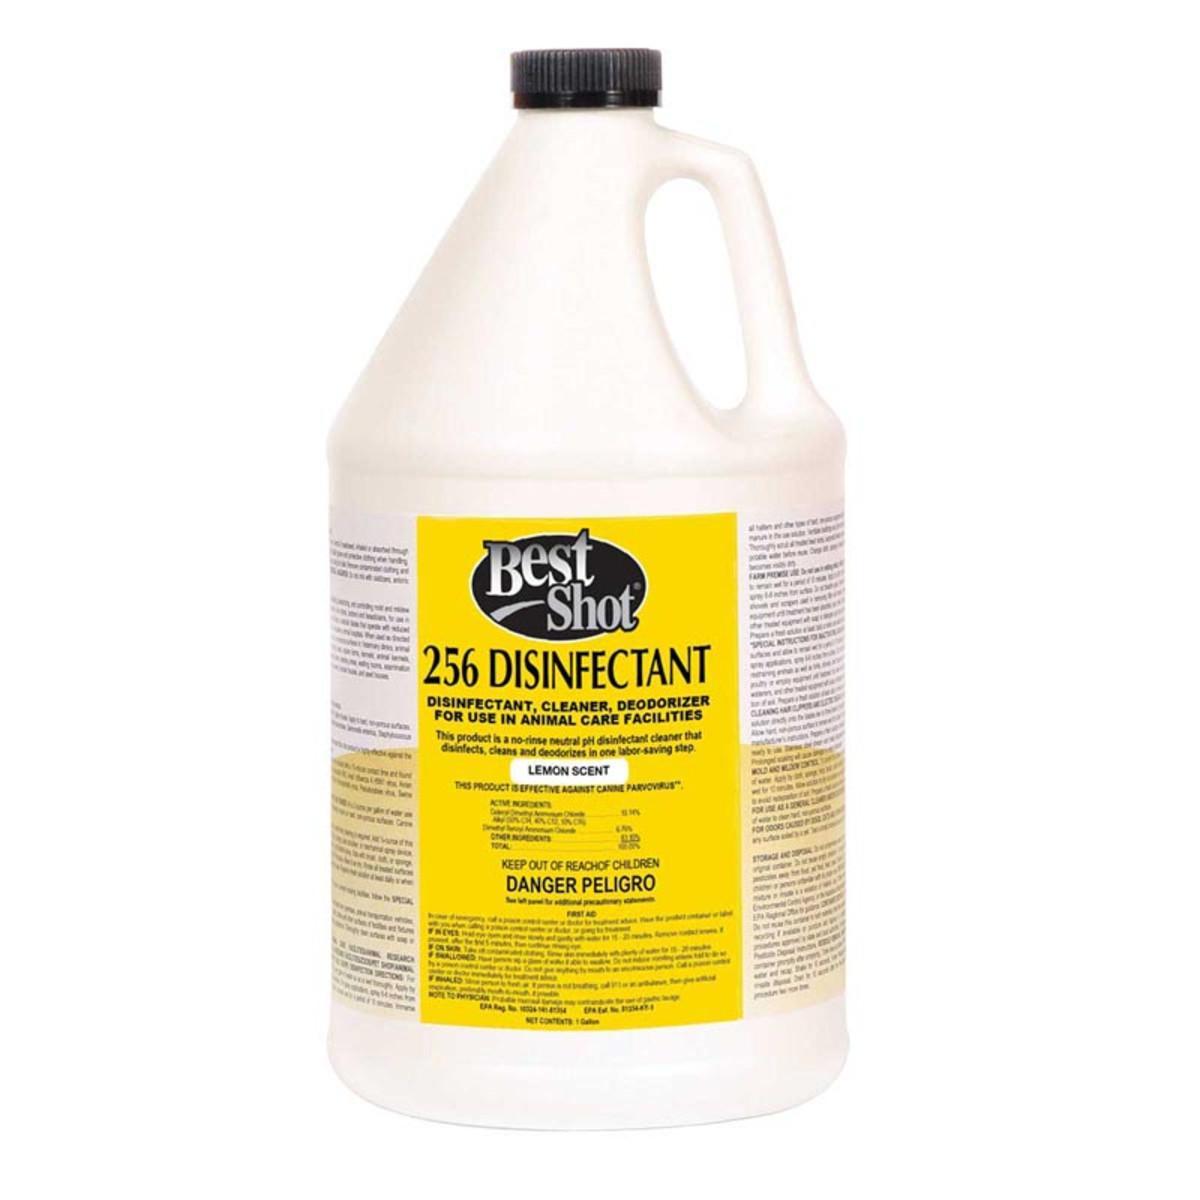 Best Shot 256:1 Disinfectant